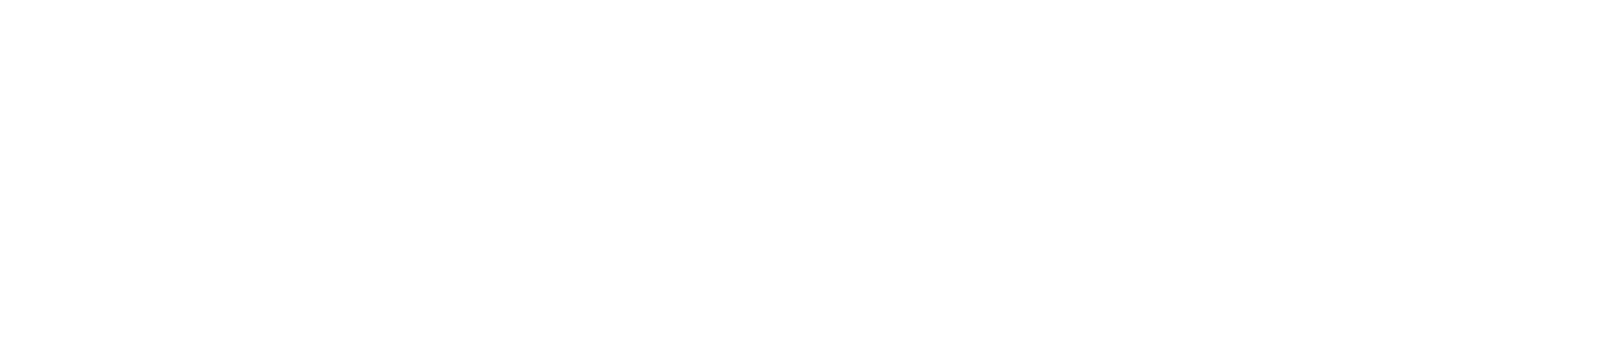 PixlArt